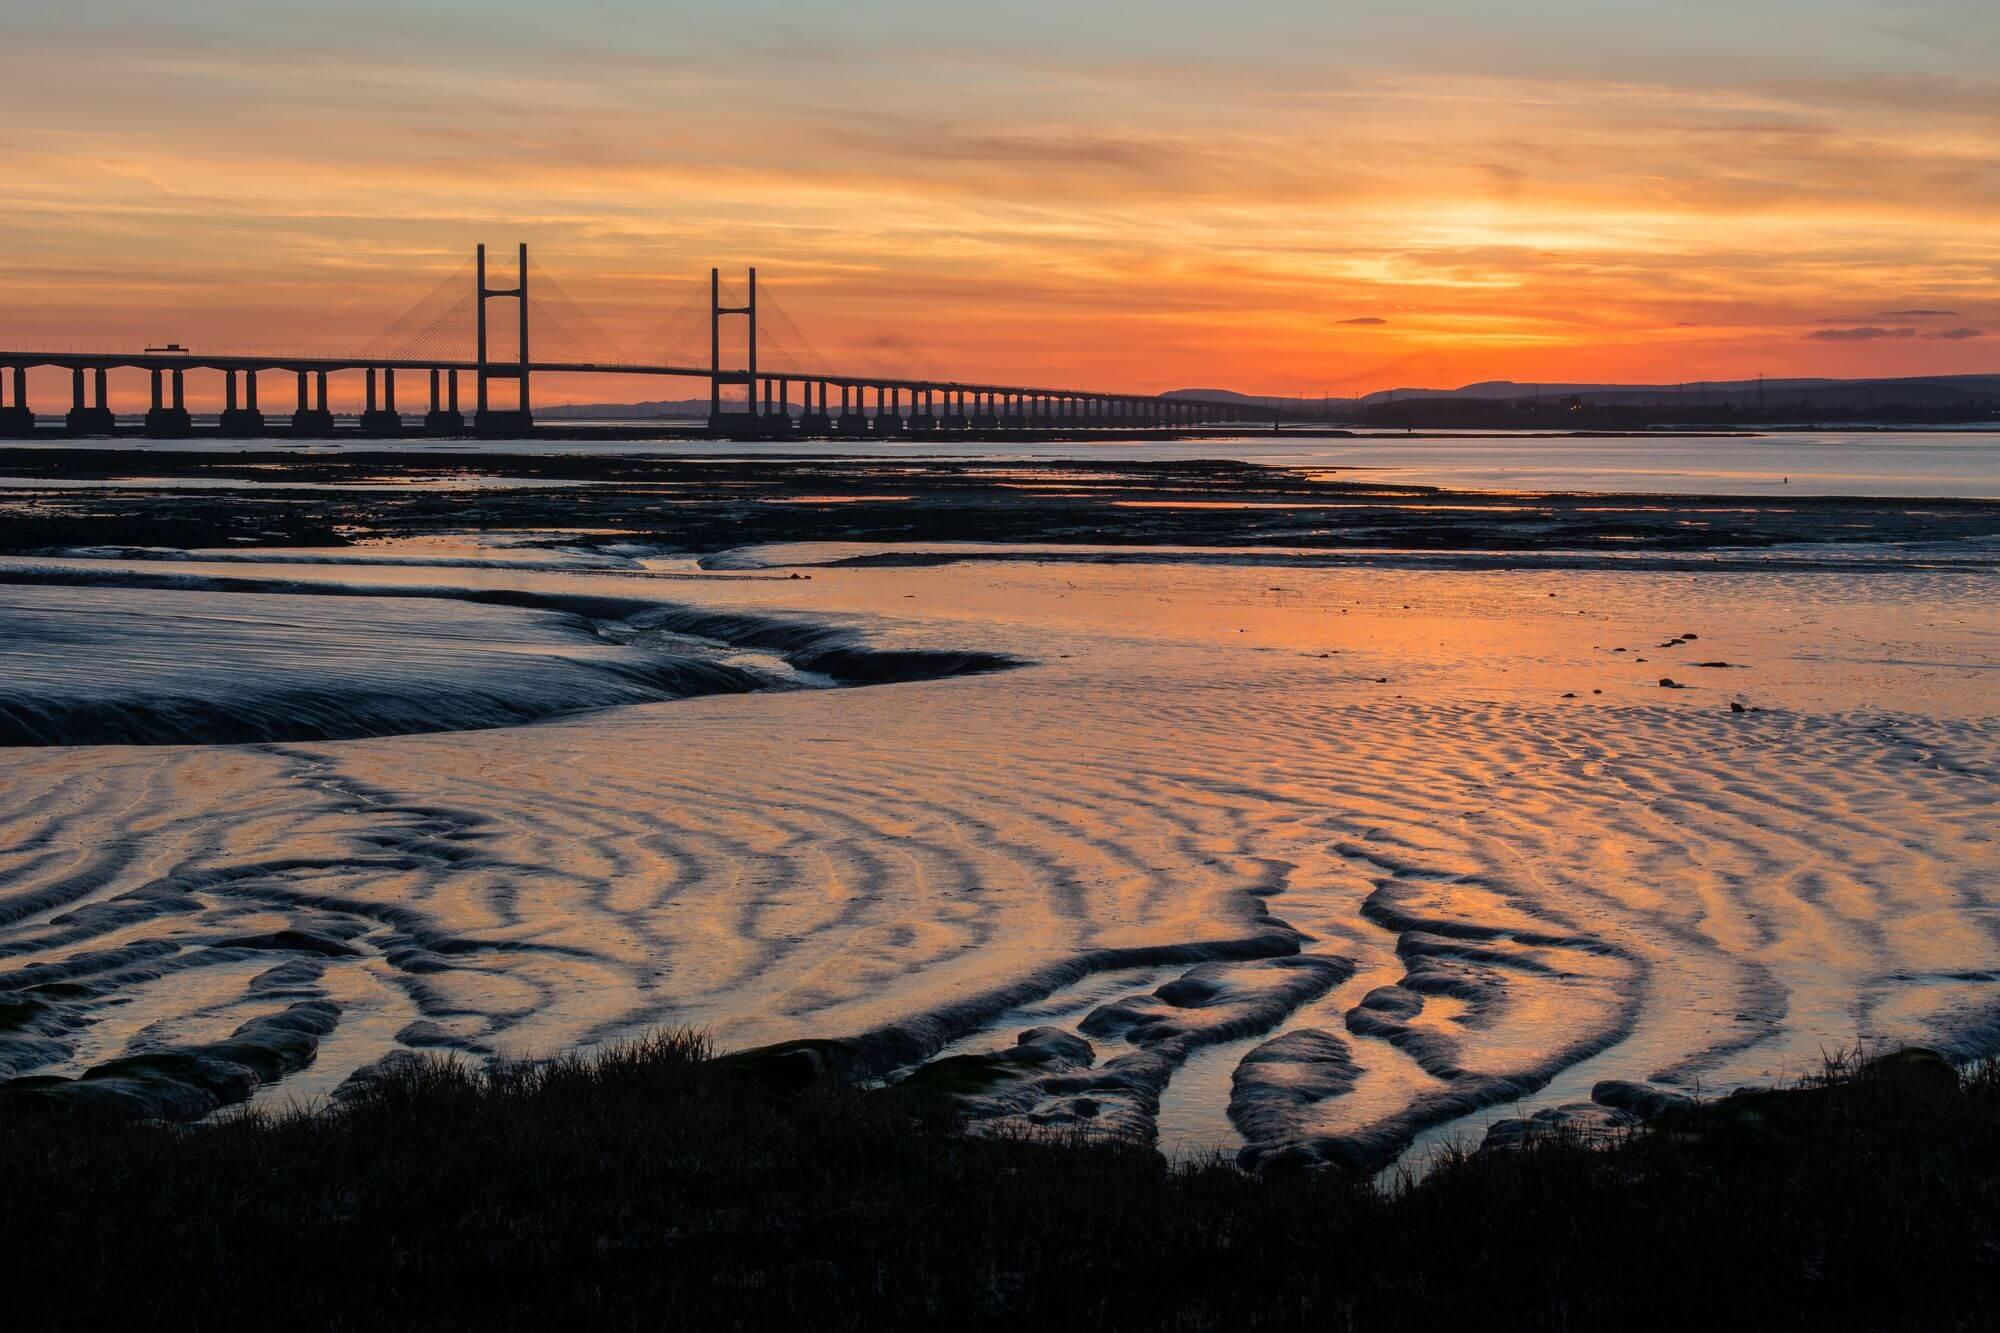 The Estuary at Twilight